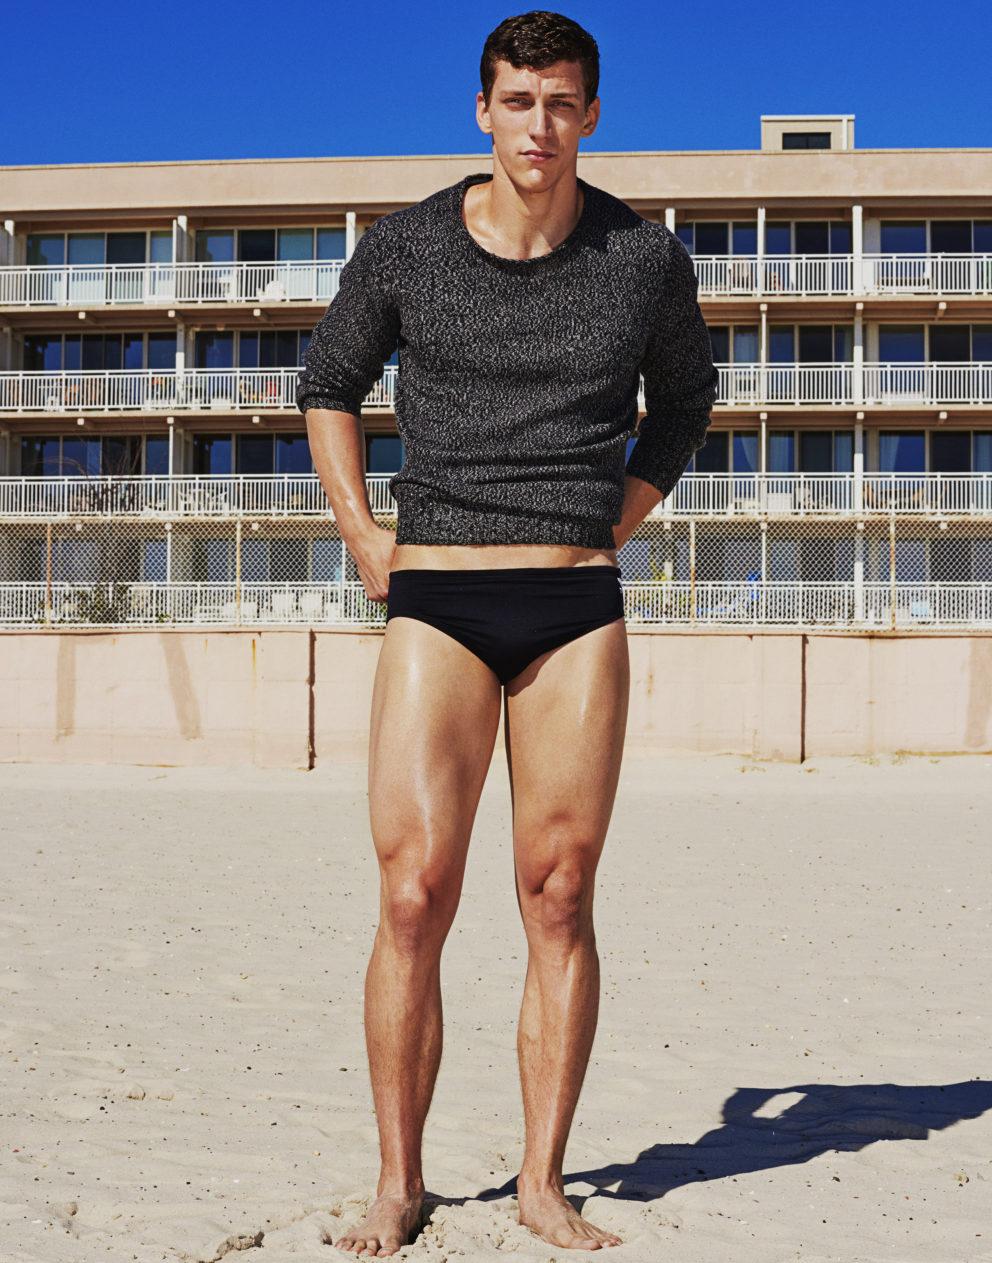 151010 Beach Boy 041 Christian Hogstedt